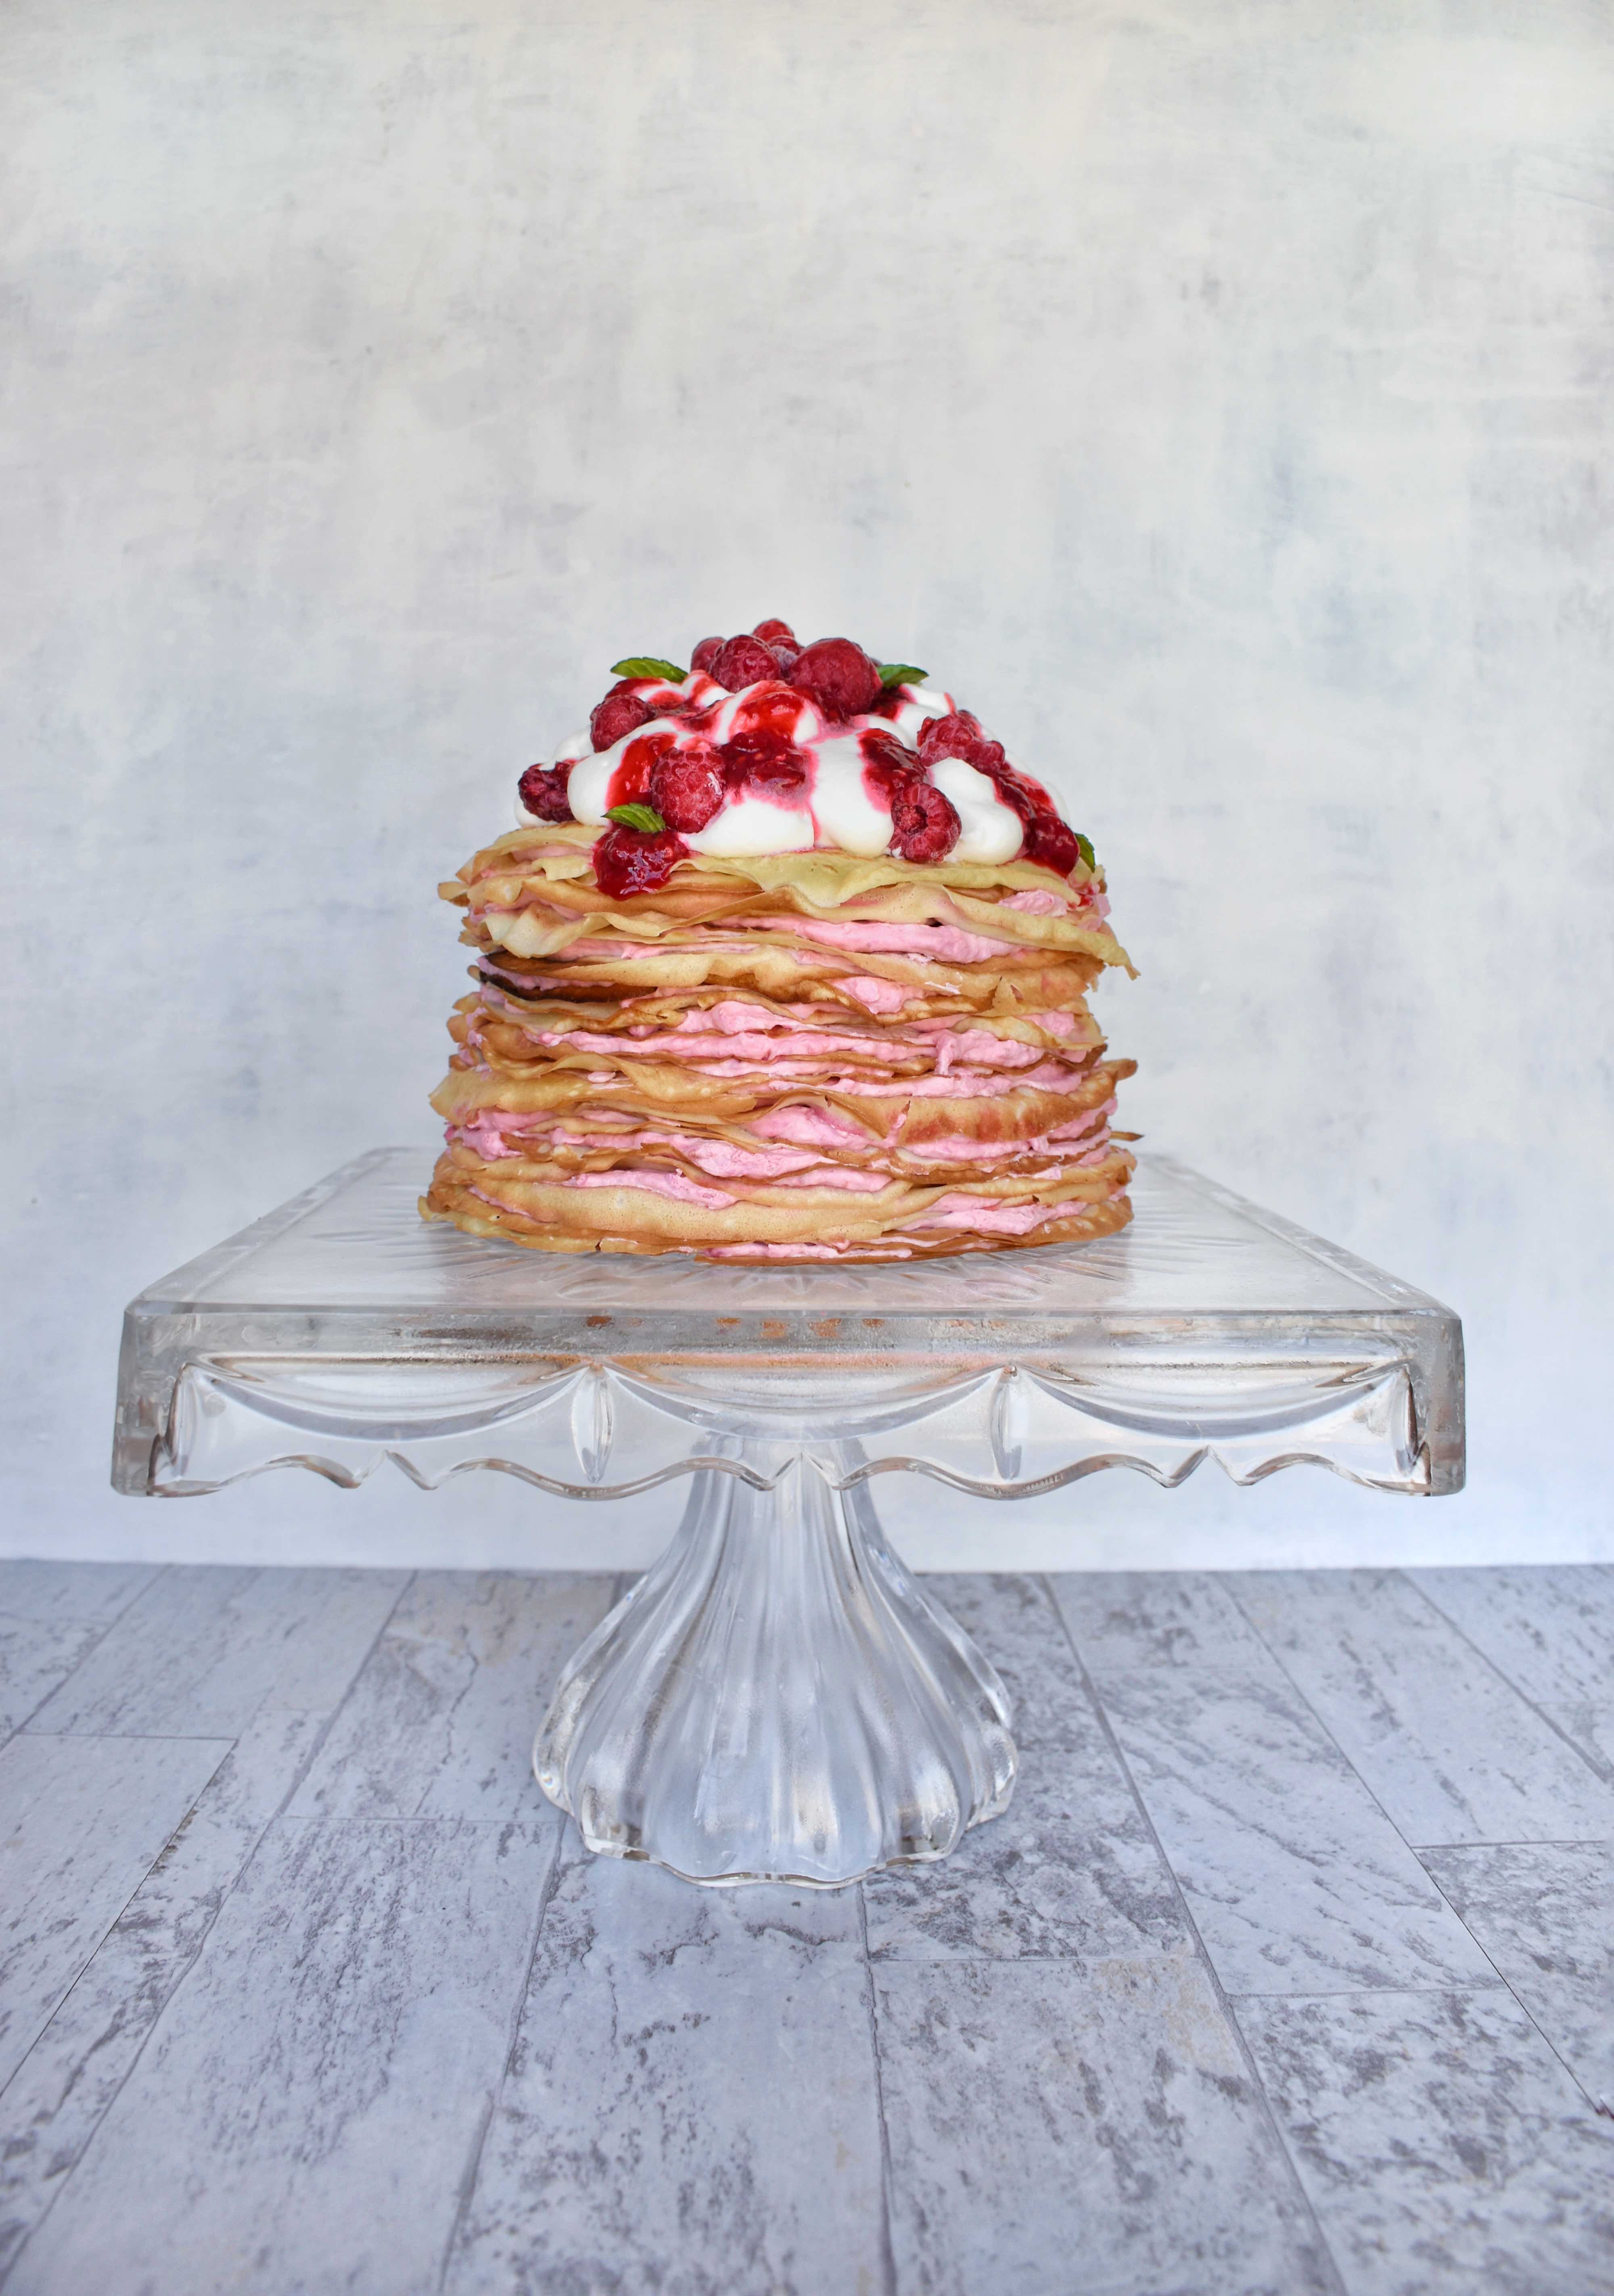 raspberry cream crepe cake on clear glass pedestal